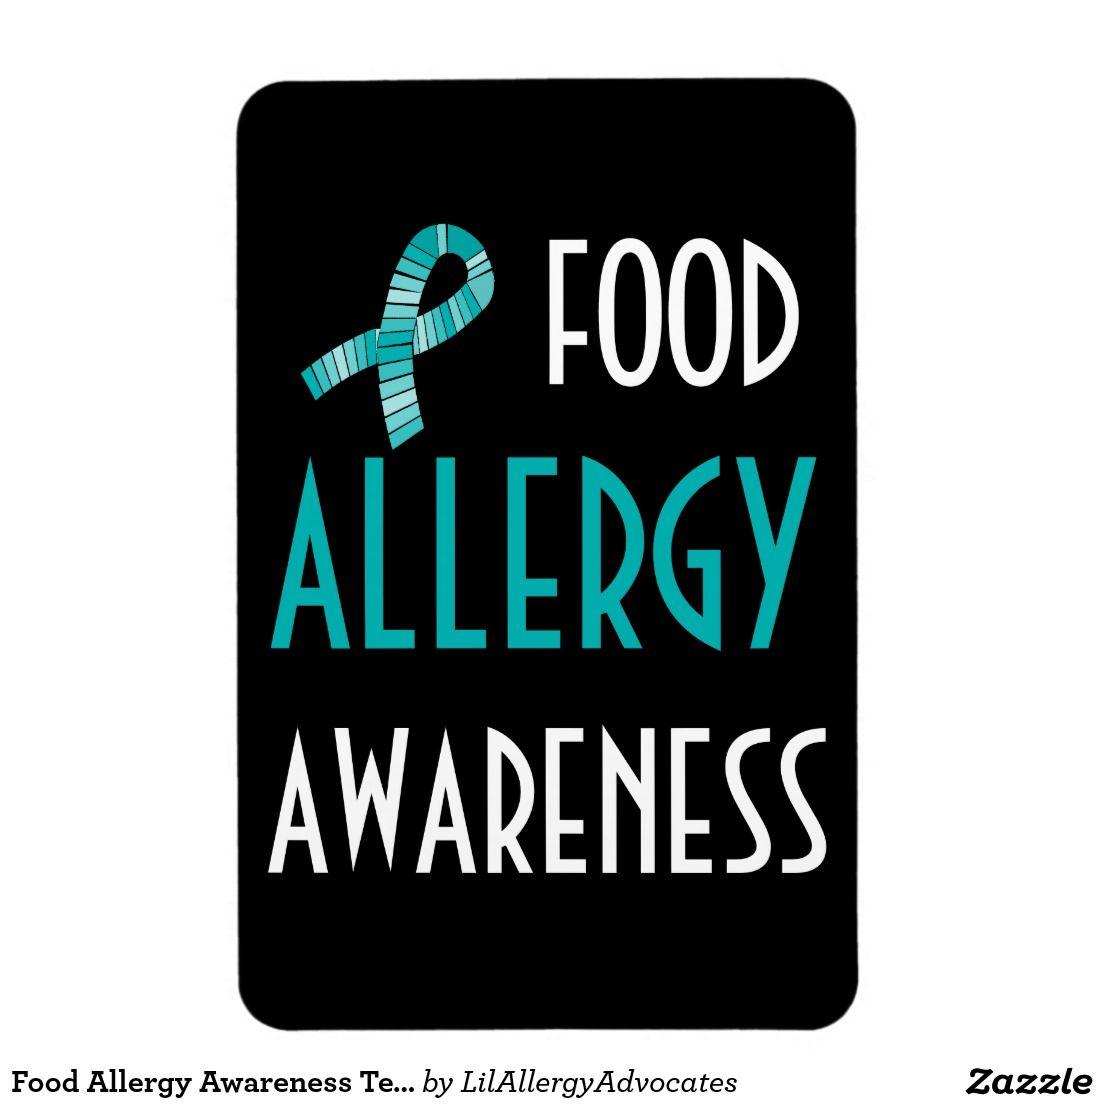 Food Allergy Awareness Teal Ribbon Black and Teal Rectangular Photo Magnet